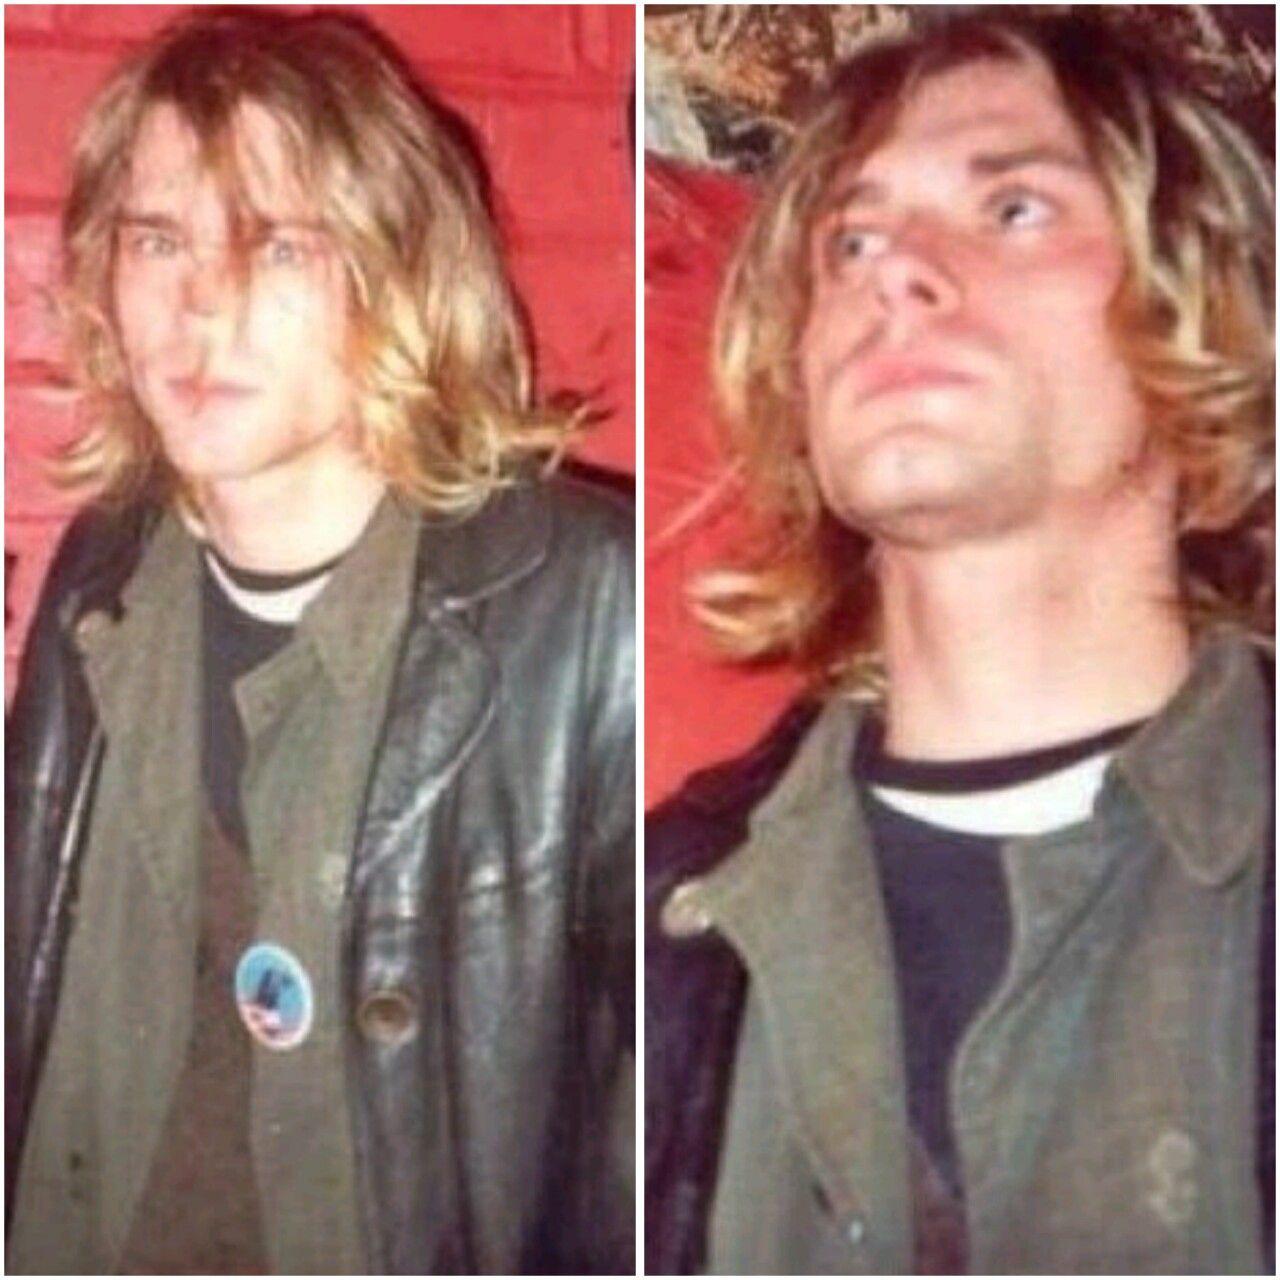 Pin By Lorraine Petitto On Kurt Cobain Legend Red Leather Jacket Leather Jacket Kurt Cobain [ 1280 x 1280 Pixel ]